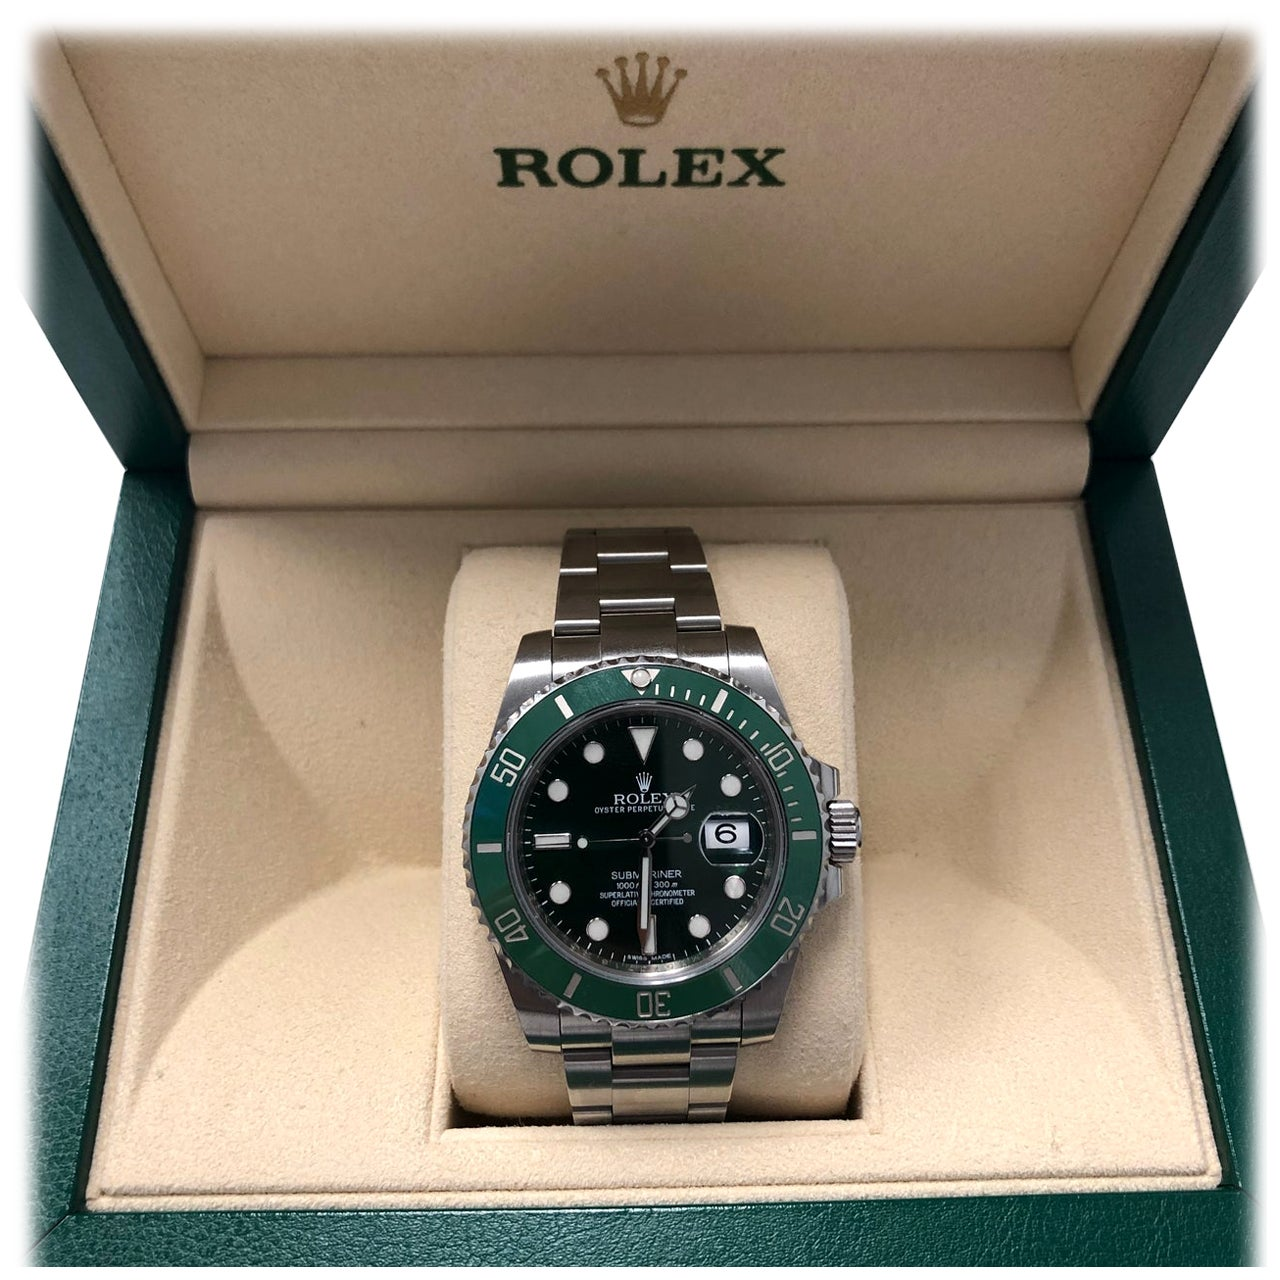 Rolex Submariner Hulk Green Dial Bezel Watch 116610LV